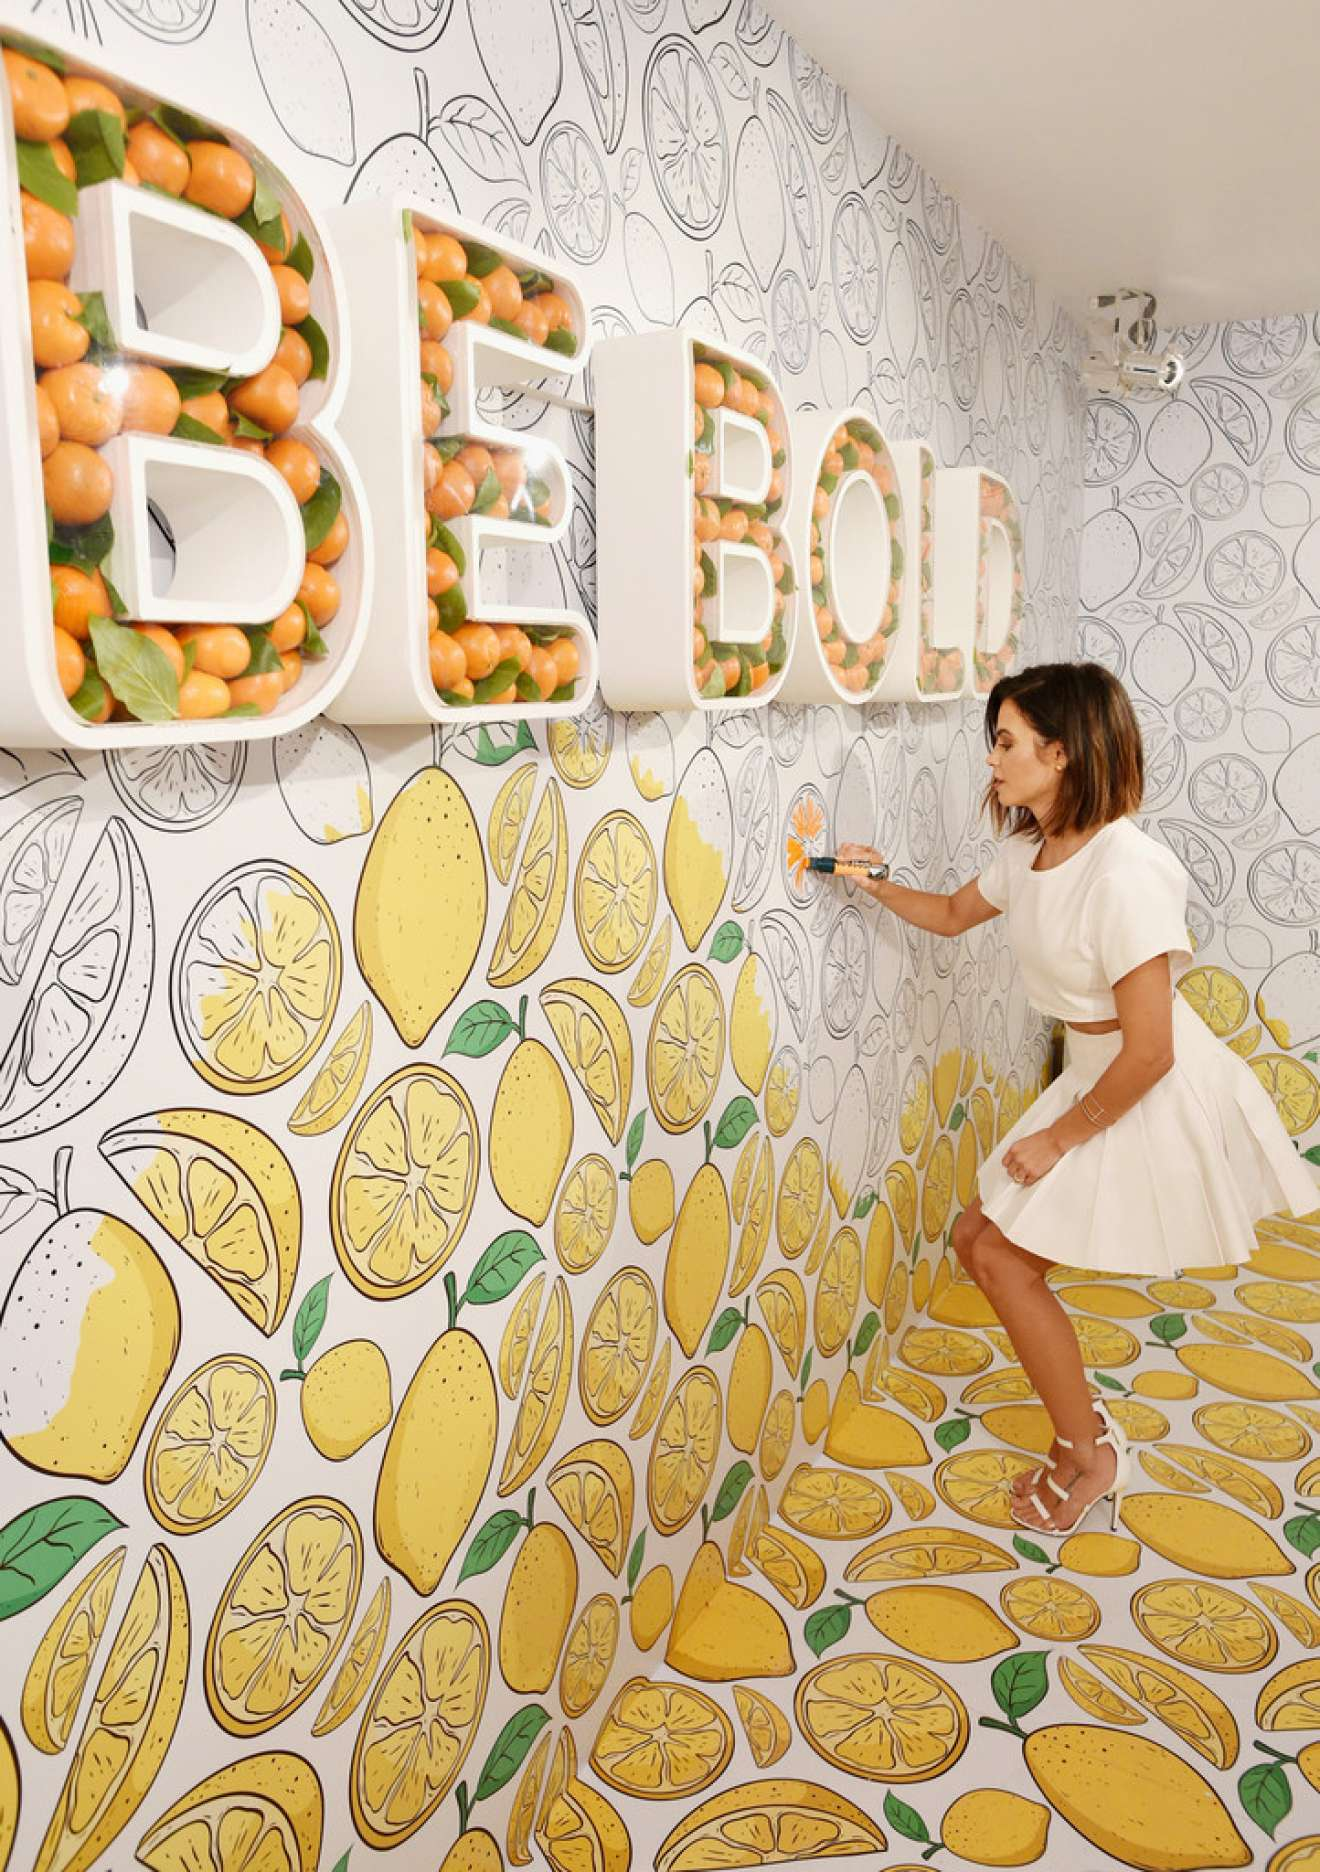 Jenna Dewan-Tatum: Young Living Essential Oils limited edition event ...